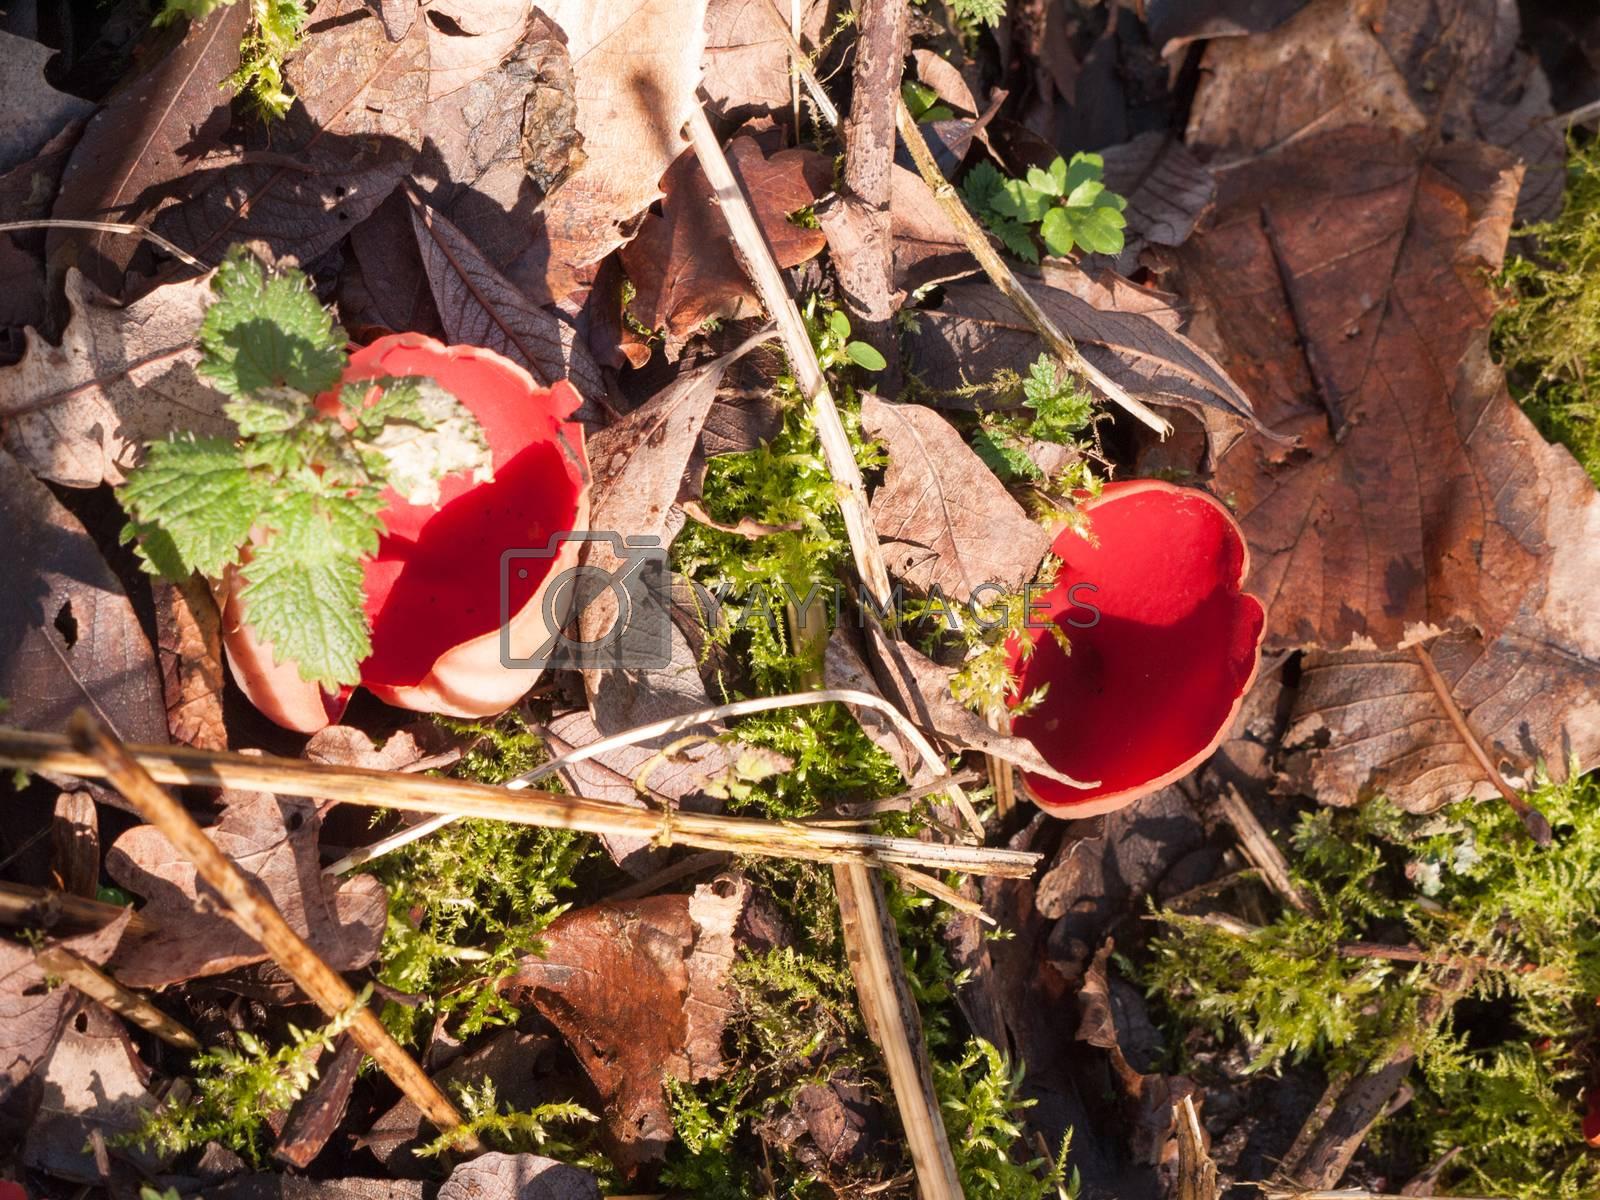 growing large red scarlet elf cups on forest moss damp floor mushrooms; essex; england; uk